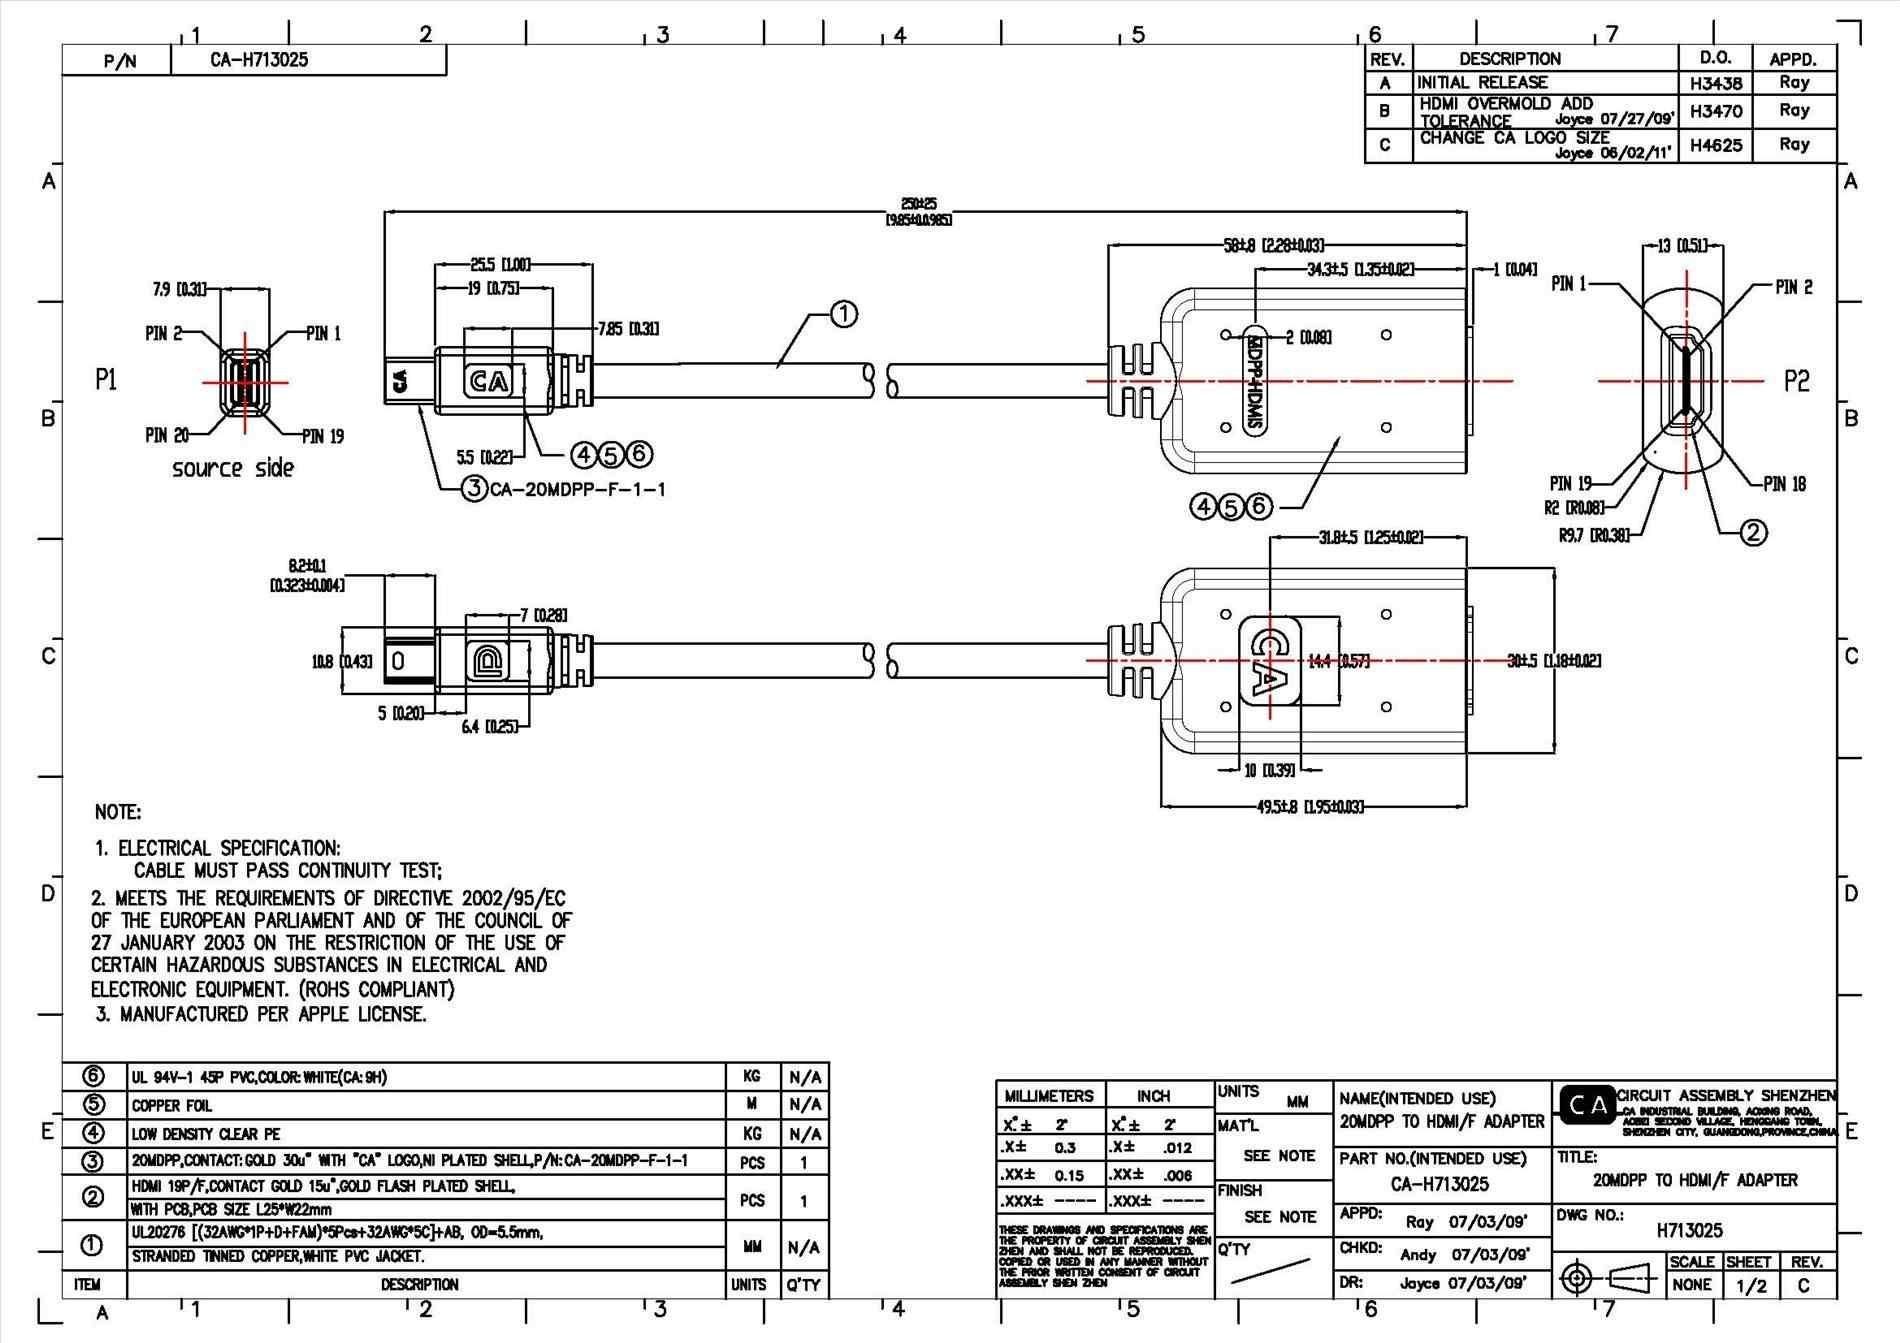 Hdmi To Vga Pinout Diagram | Manual E-Books - Hdmi To Vga Wiring Diagram